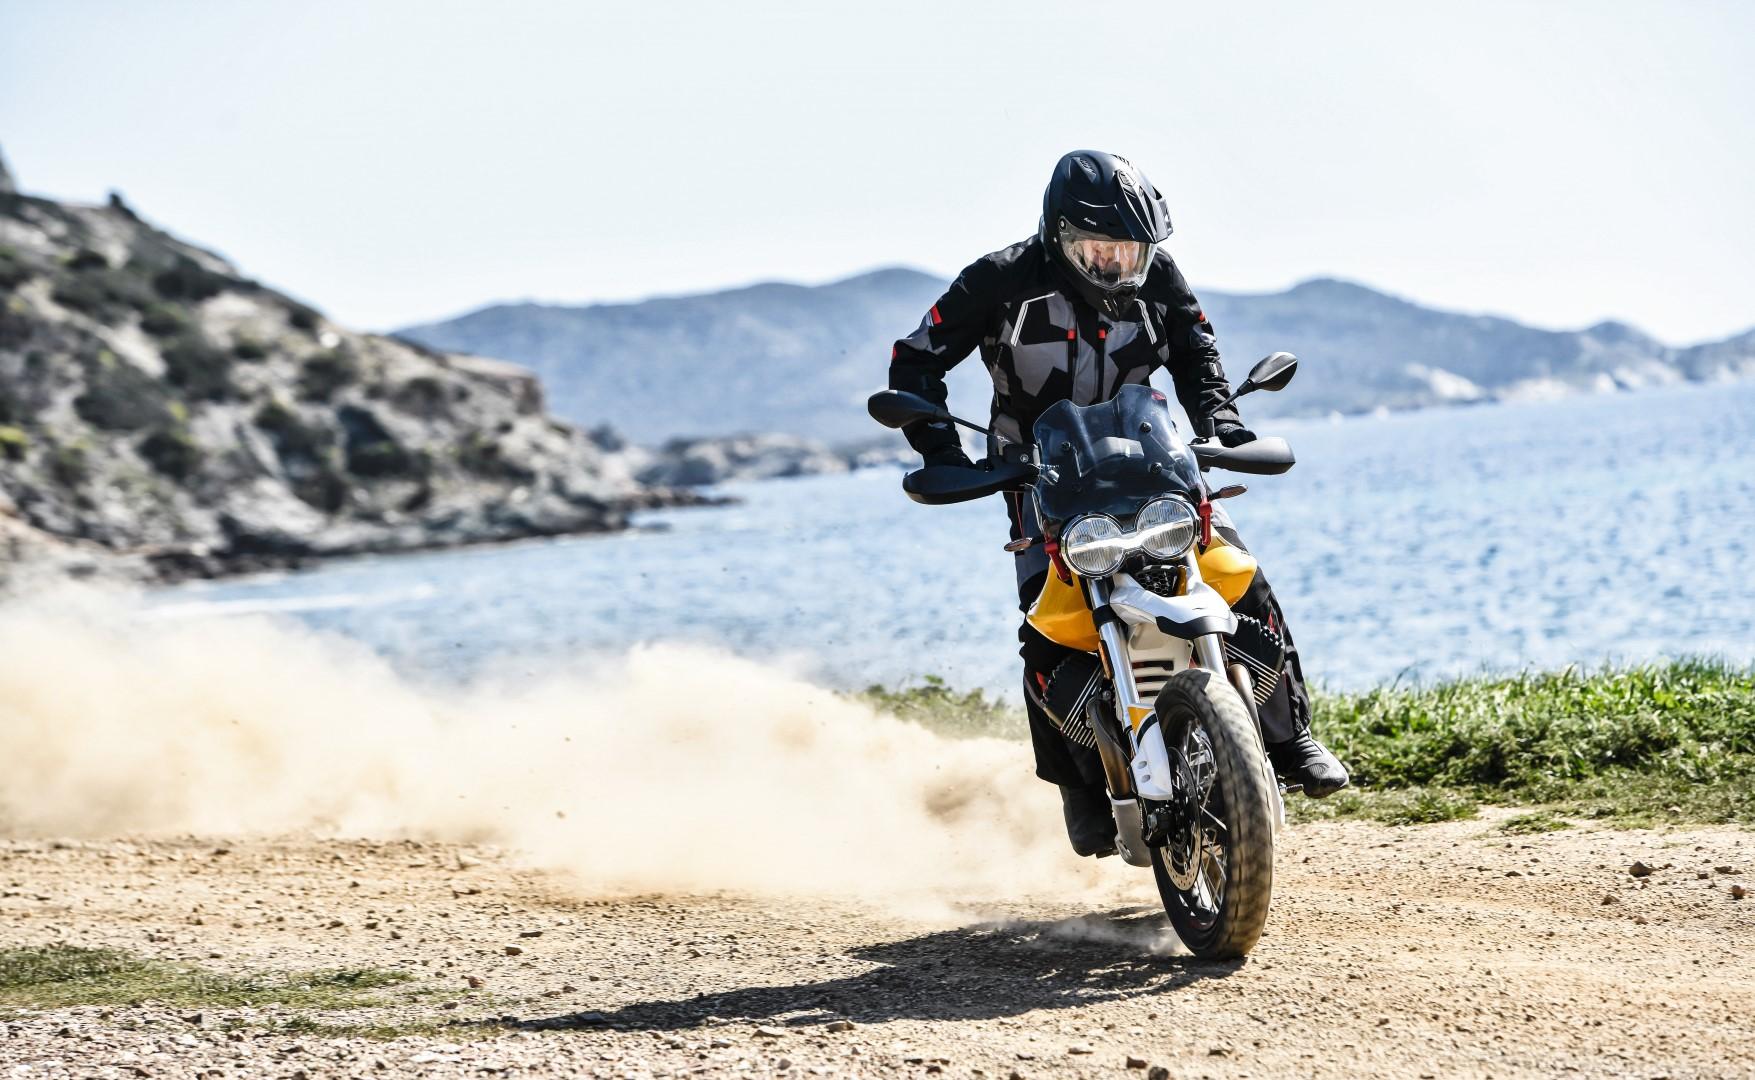 Moto Guzzi V85 TT, prueba, ficha técnica y primeras impresiones